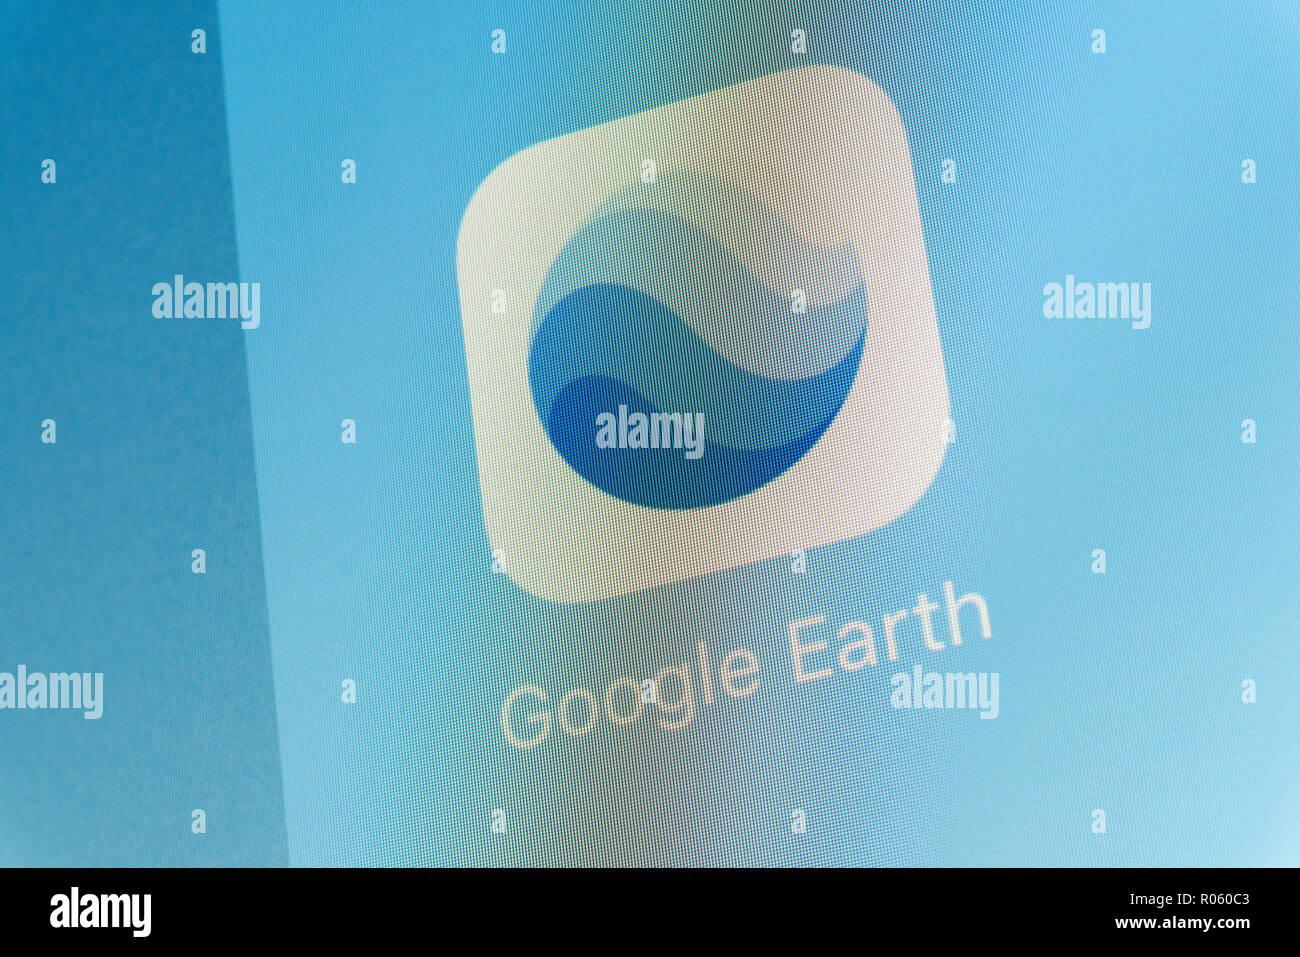 google earth pro password username